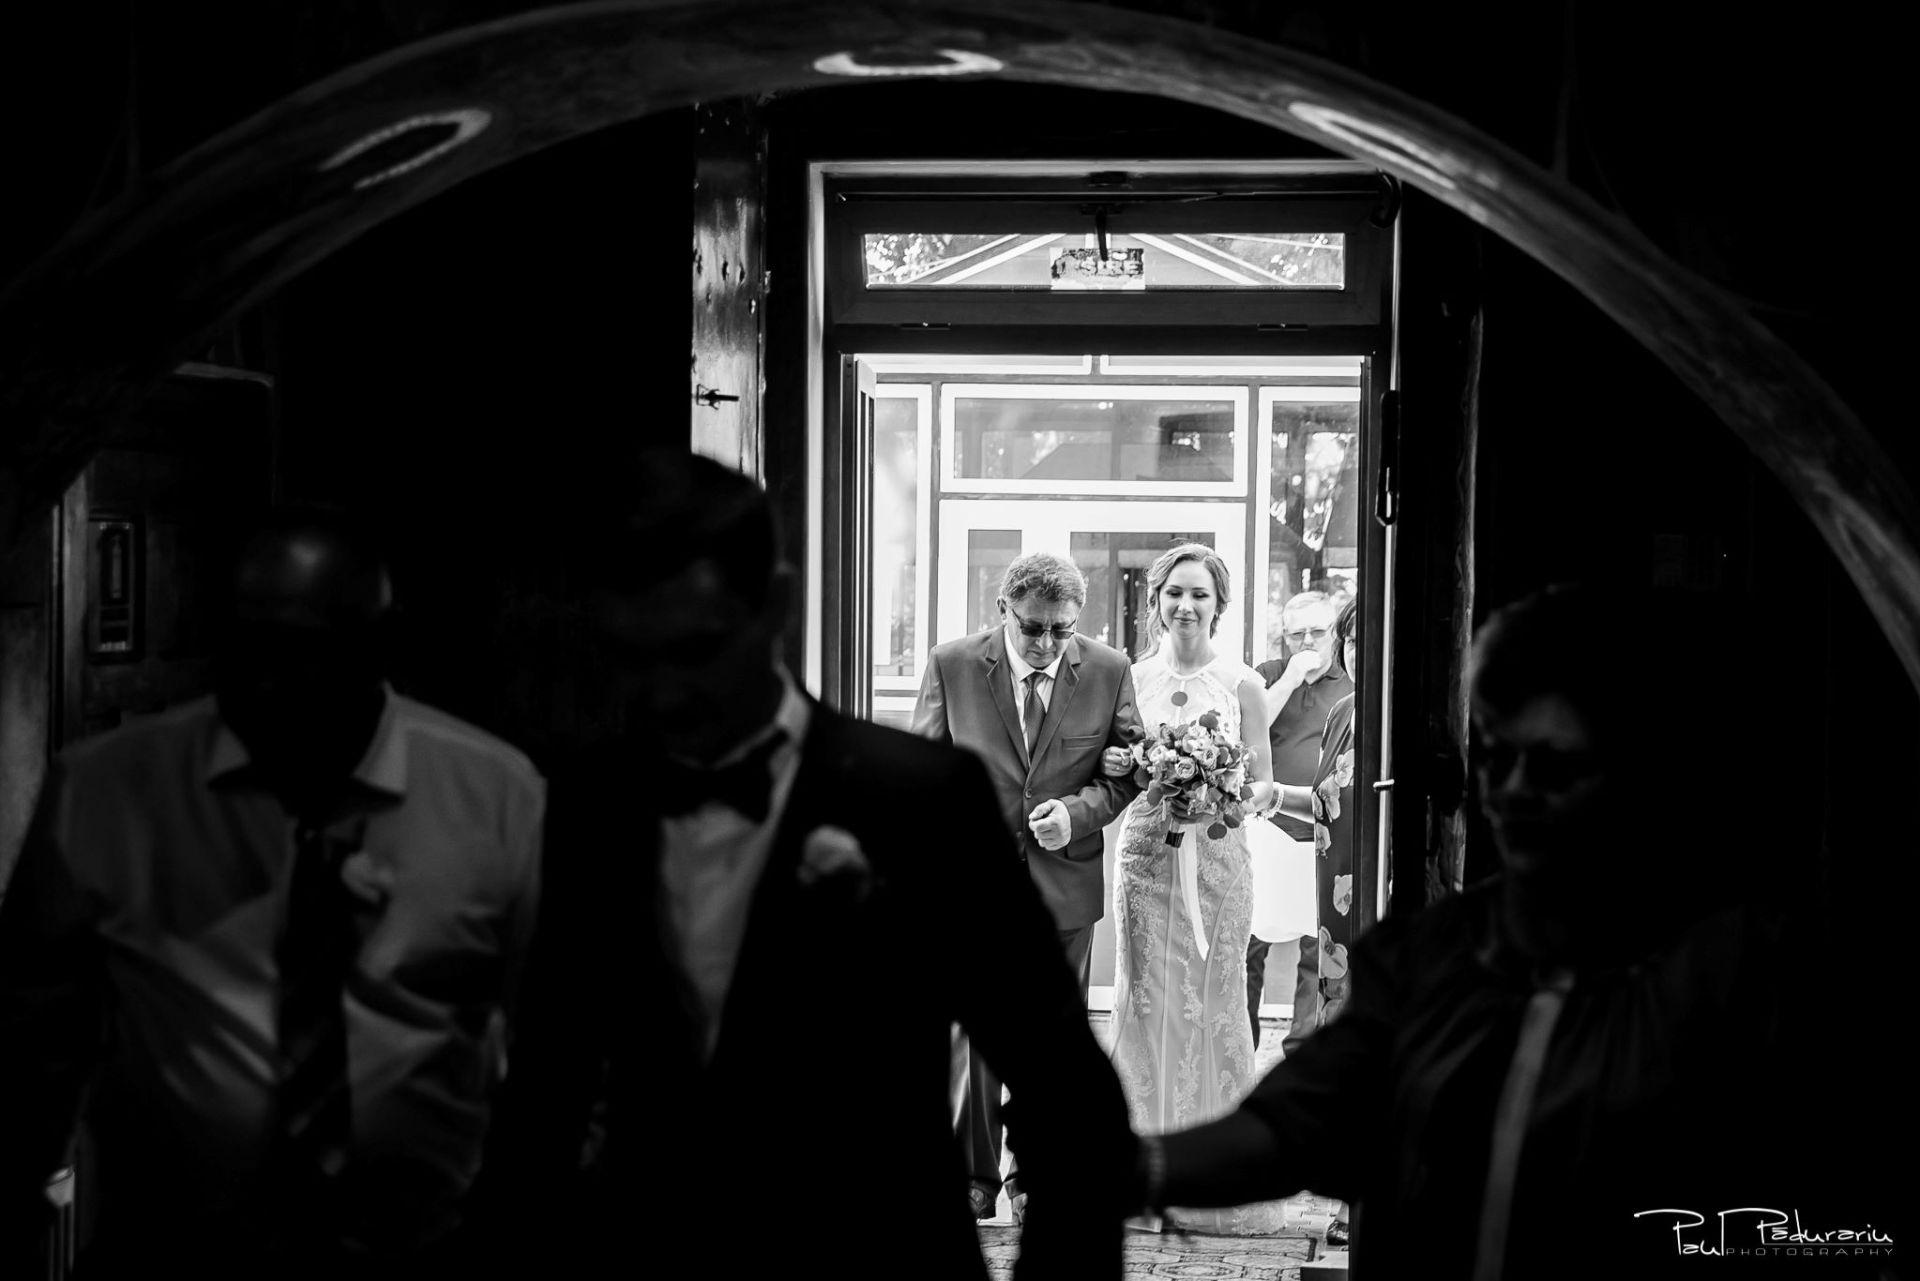 Nicoleta si Catalin fotografie nunta Iasi Biserica Rotunda Letcani fotograf nunta Iasi paul padurariu 2018 1